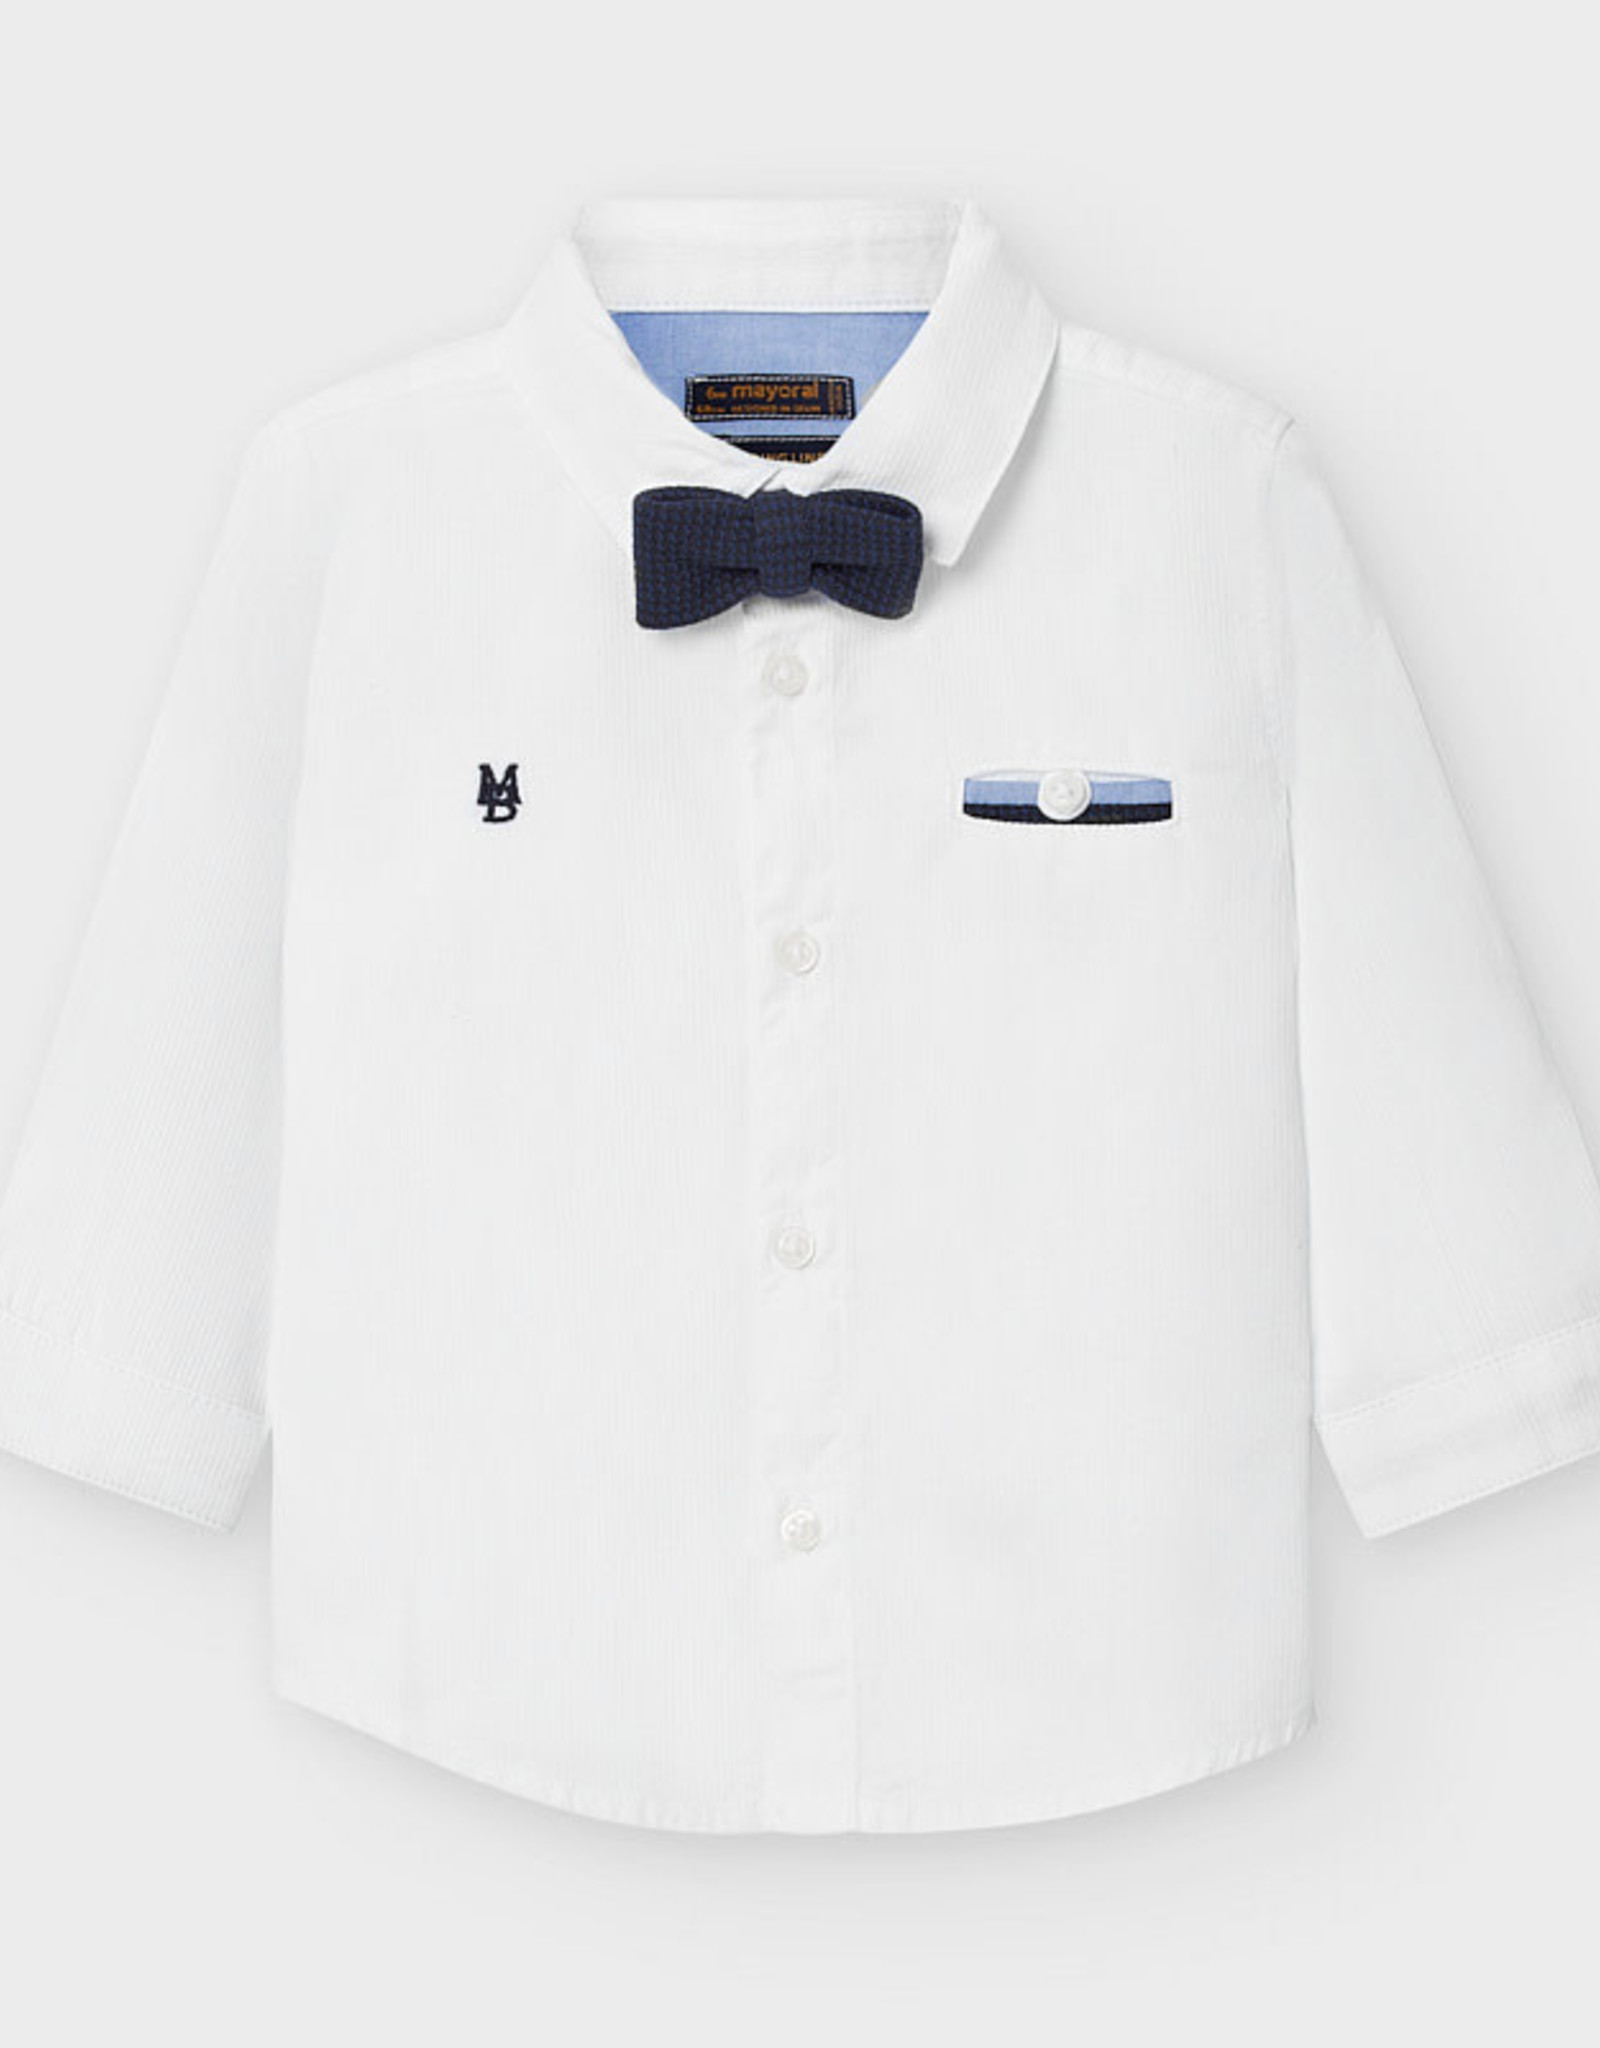 Mayoral Mayoral Long Sleeve Dress Shirt